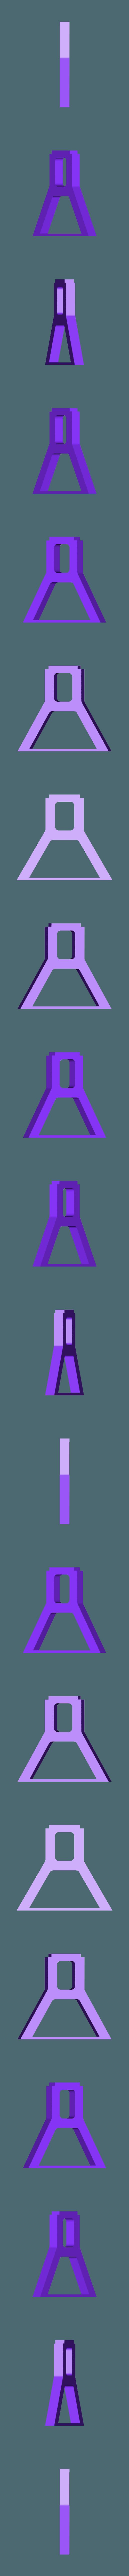 rampes scx24 pied jonction plane h50.STL Download STL file AXIAL SCX24 mini or micro crawler Bridge 50 mm  • 3D printing design, lulu3Dbuilder